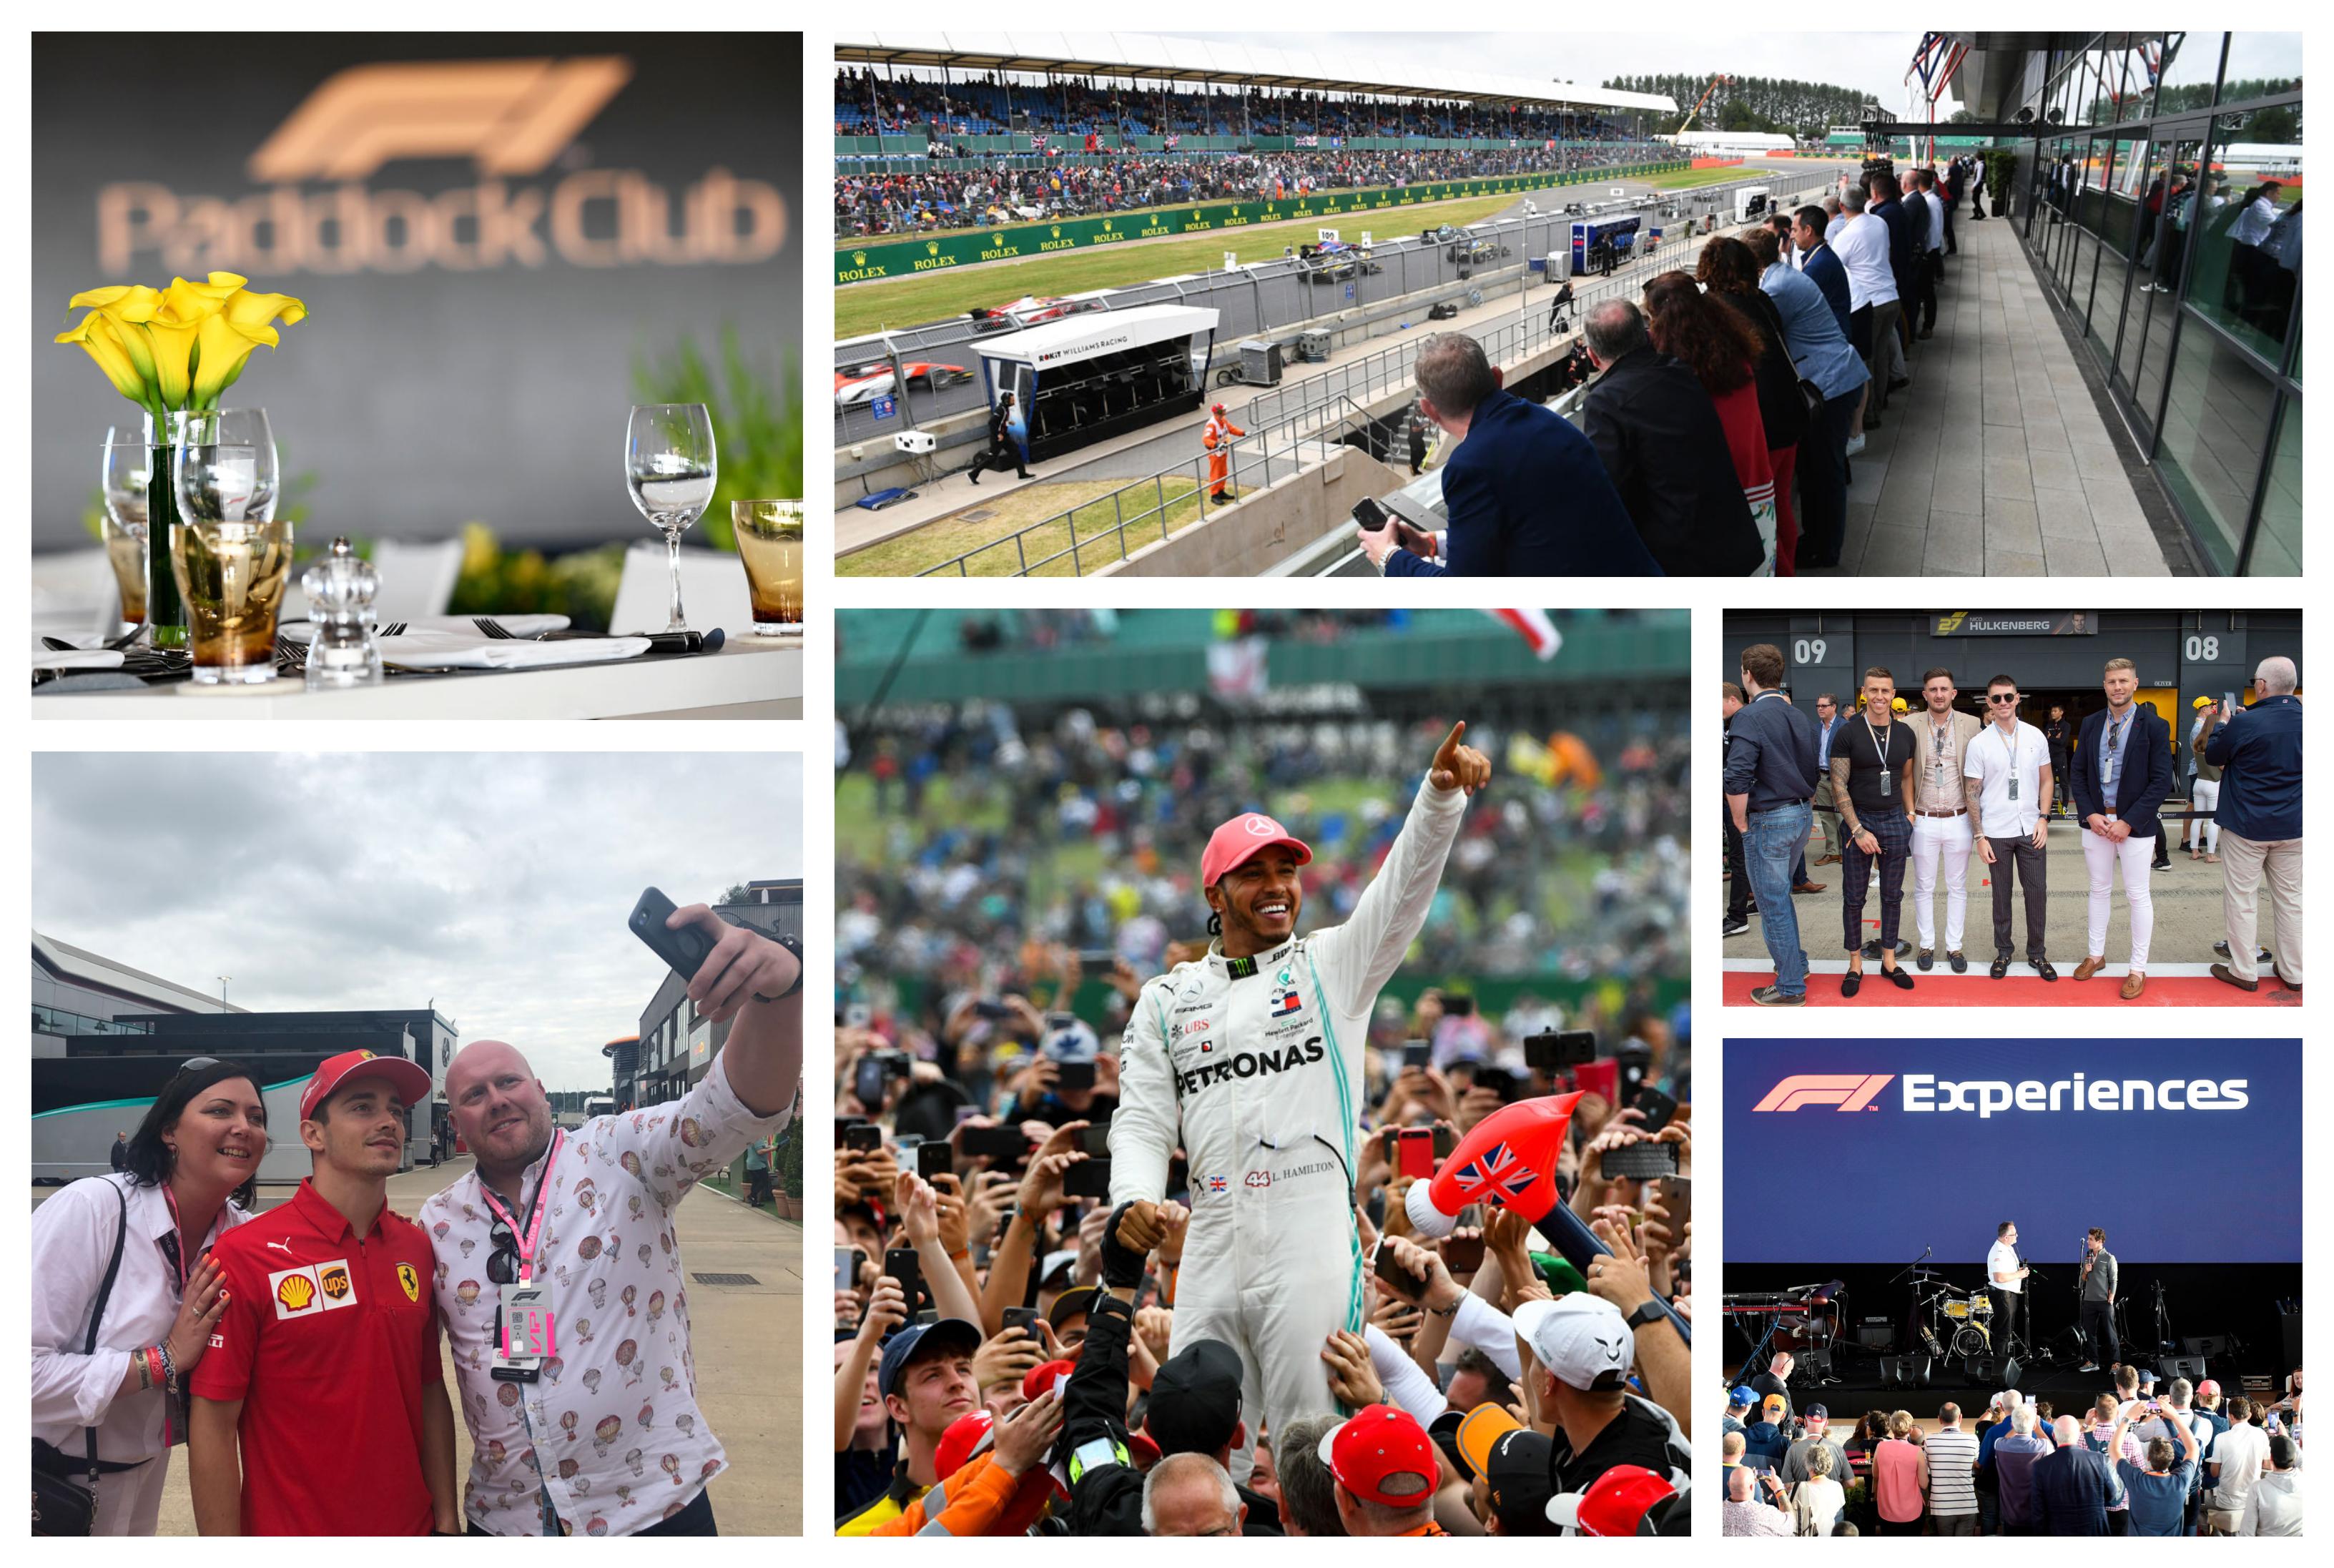 F1 Engeland – Silverstone 2021 – Legend ticketpakket (Paddock Club™) F1® Experiences